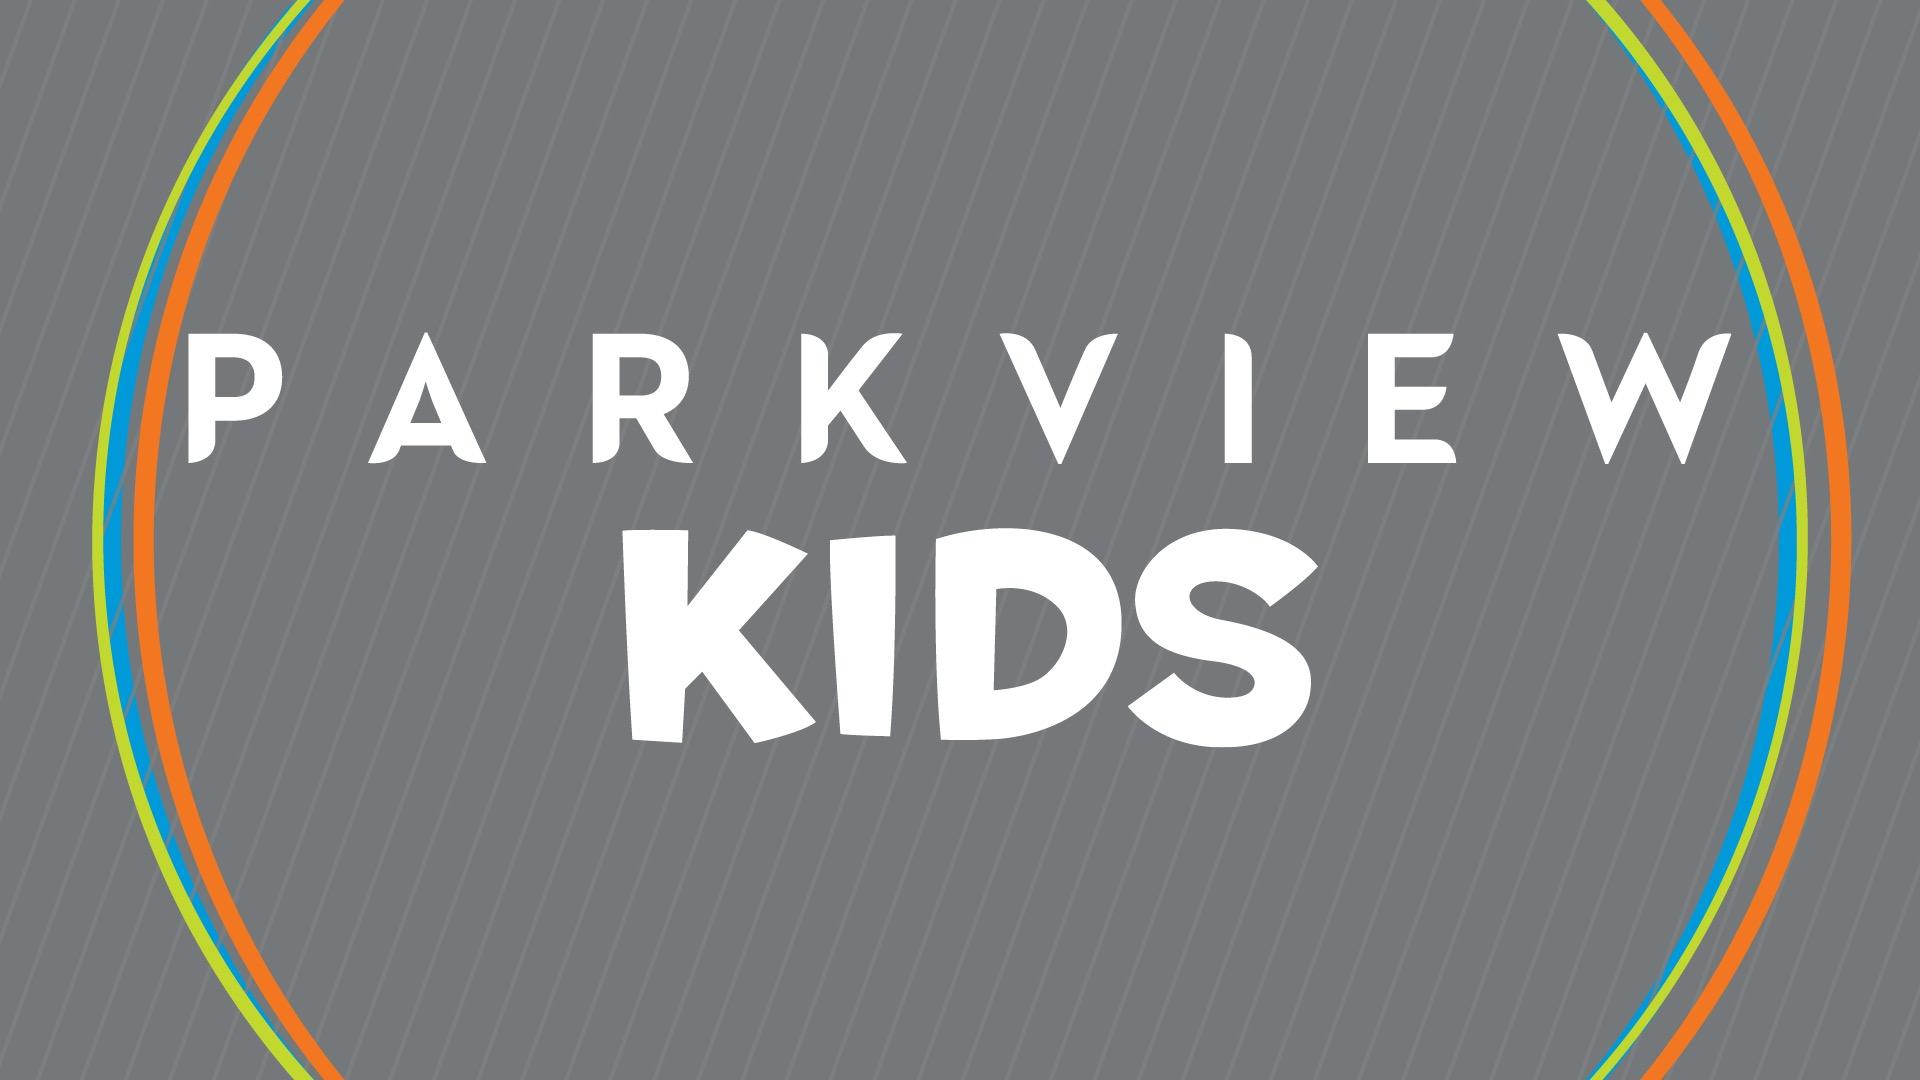 Parkview kids